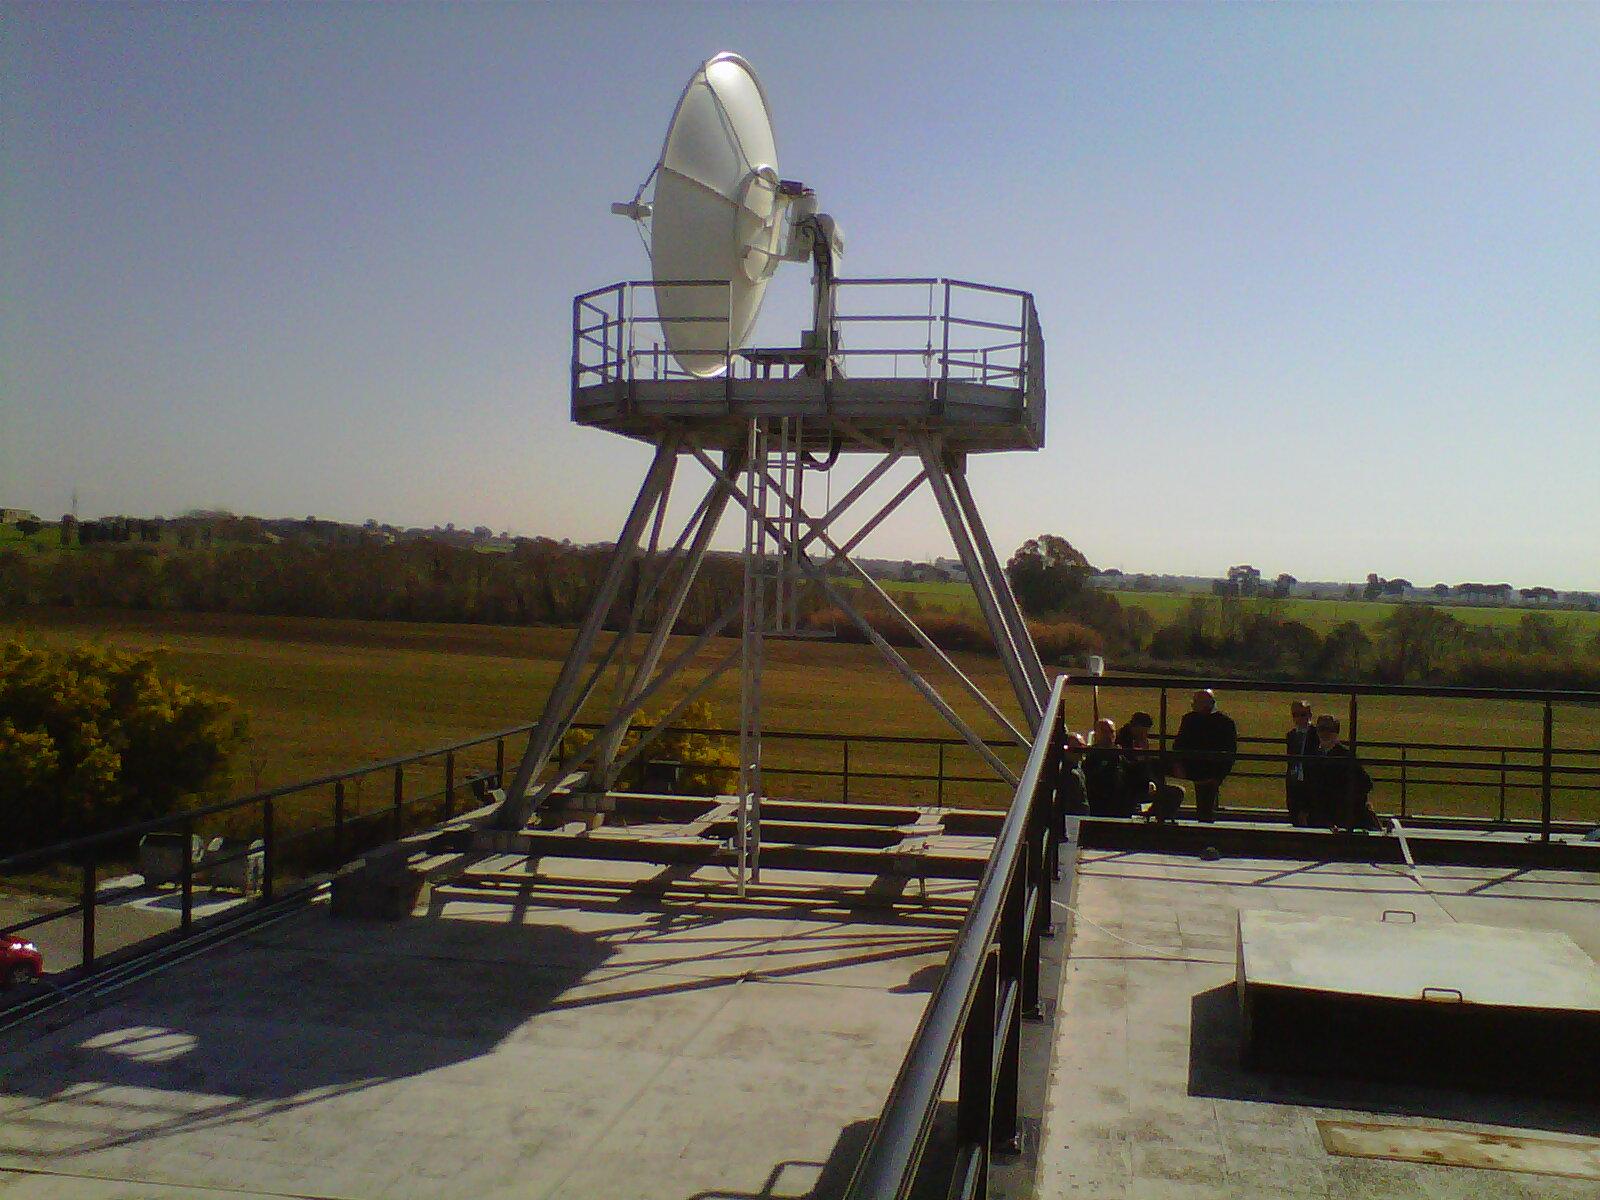 <H0>Teledife</H0><br />Antenna radar per dati satellitari<br />Aeroporto di Pratica di Mare